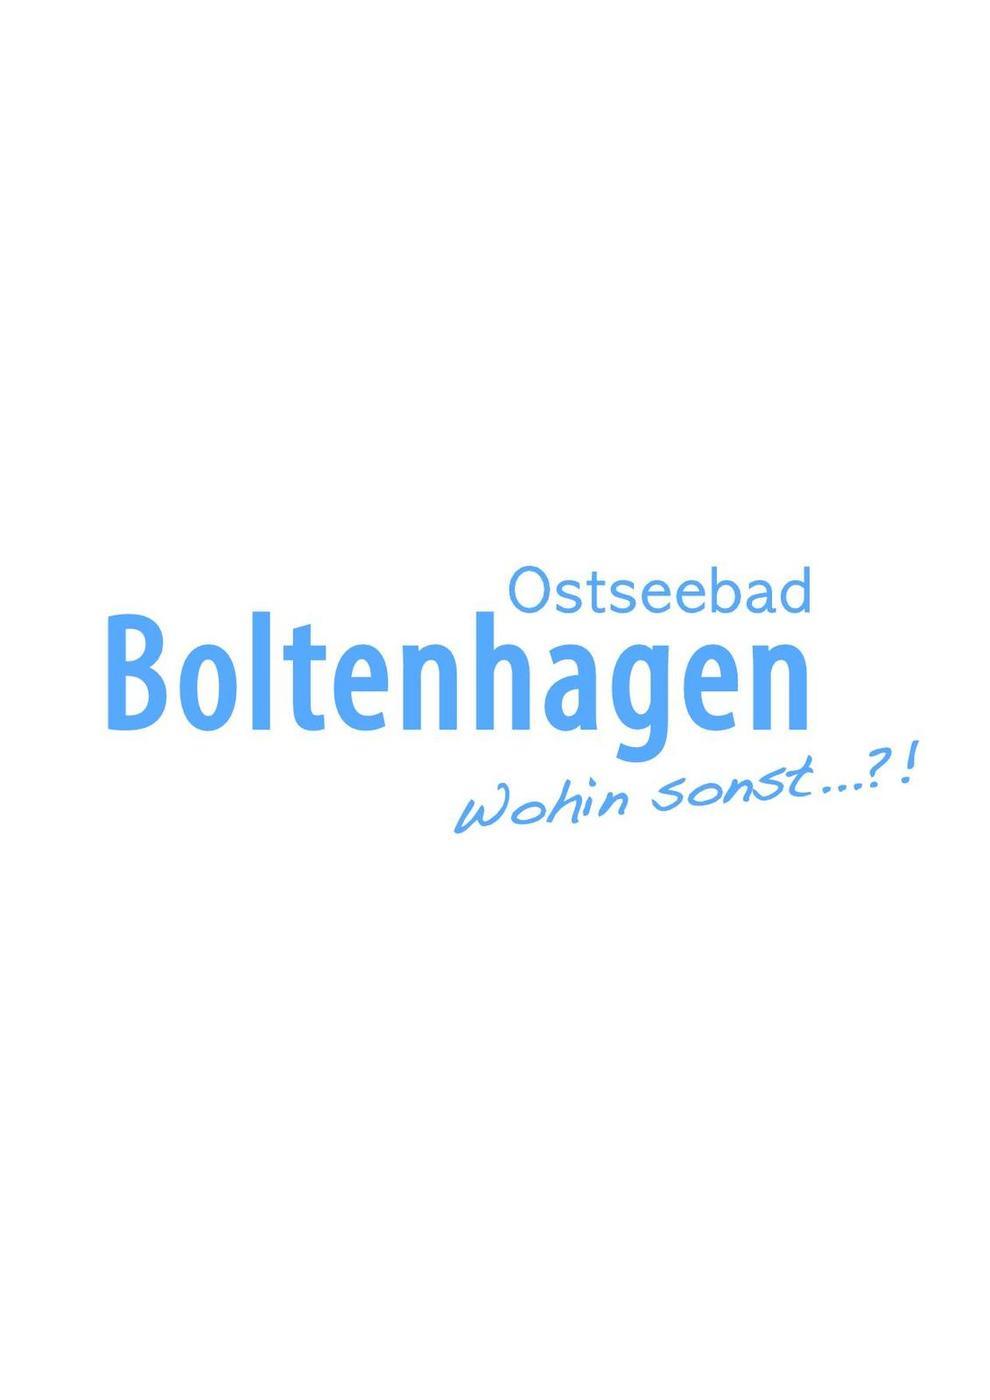 Ostseebad Boltenhagen Karte.Ostseebad Boltenhagen Seeheilbäder Kur Und Erholungsorte